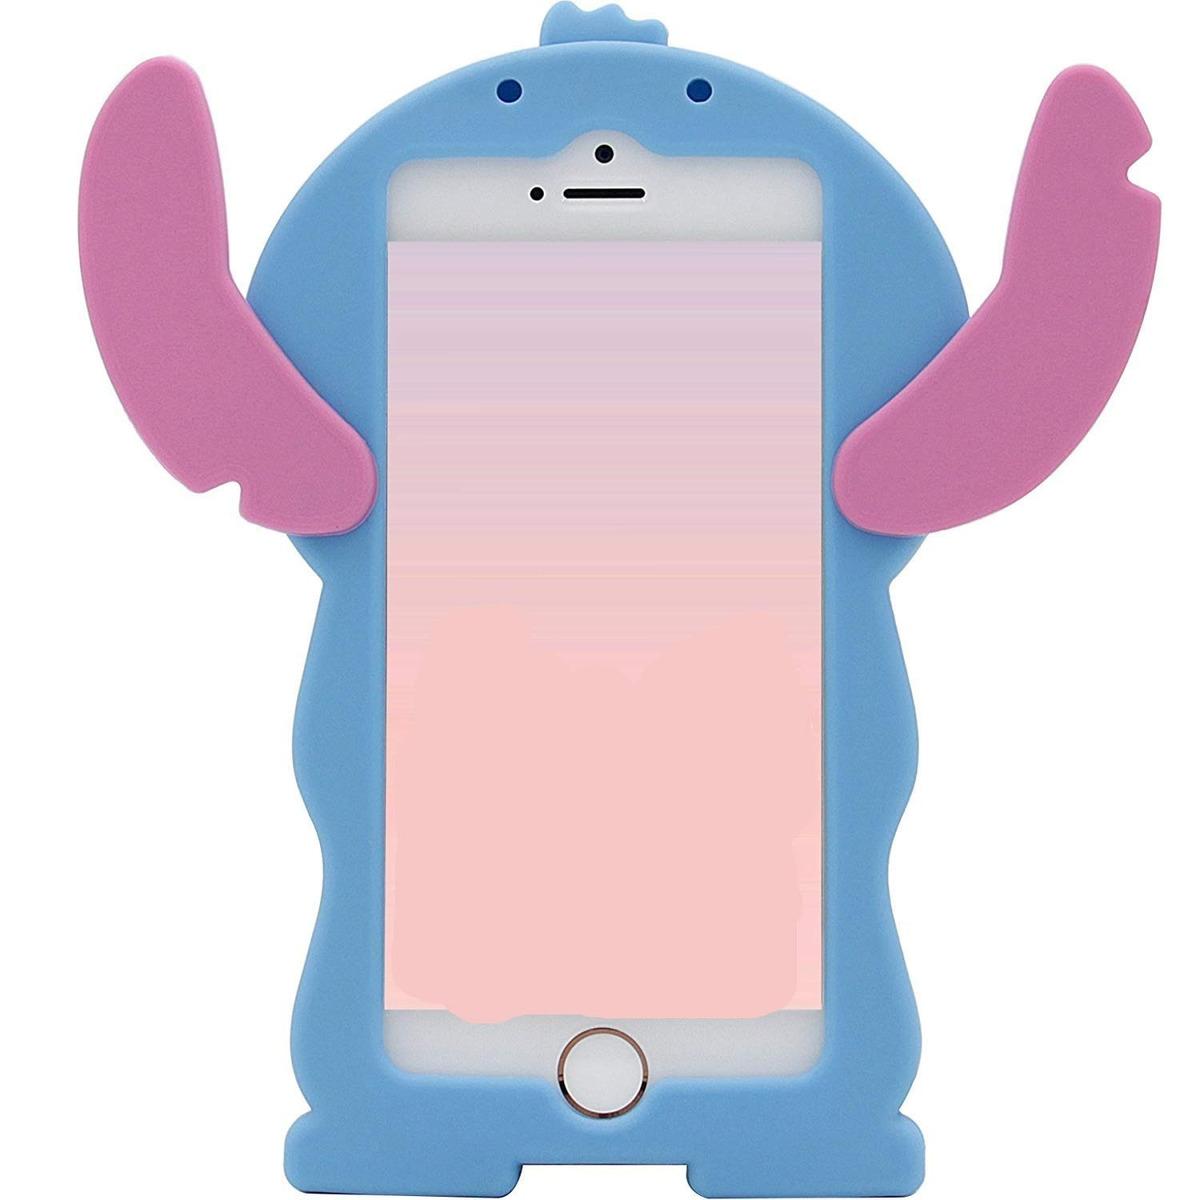 Blue Stitch Funda Para iPhone 8/ 7 4.7-inch3d Cartoon Anima